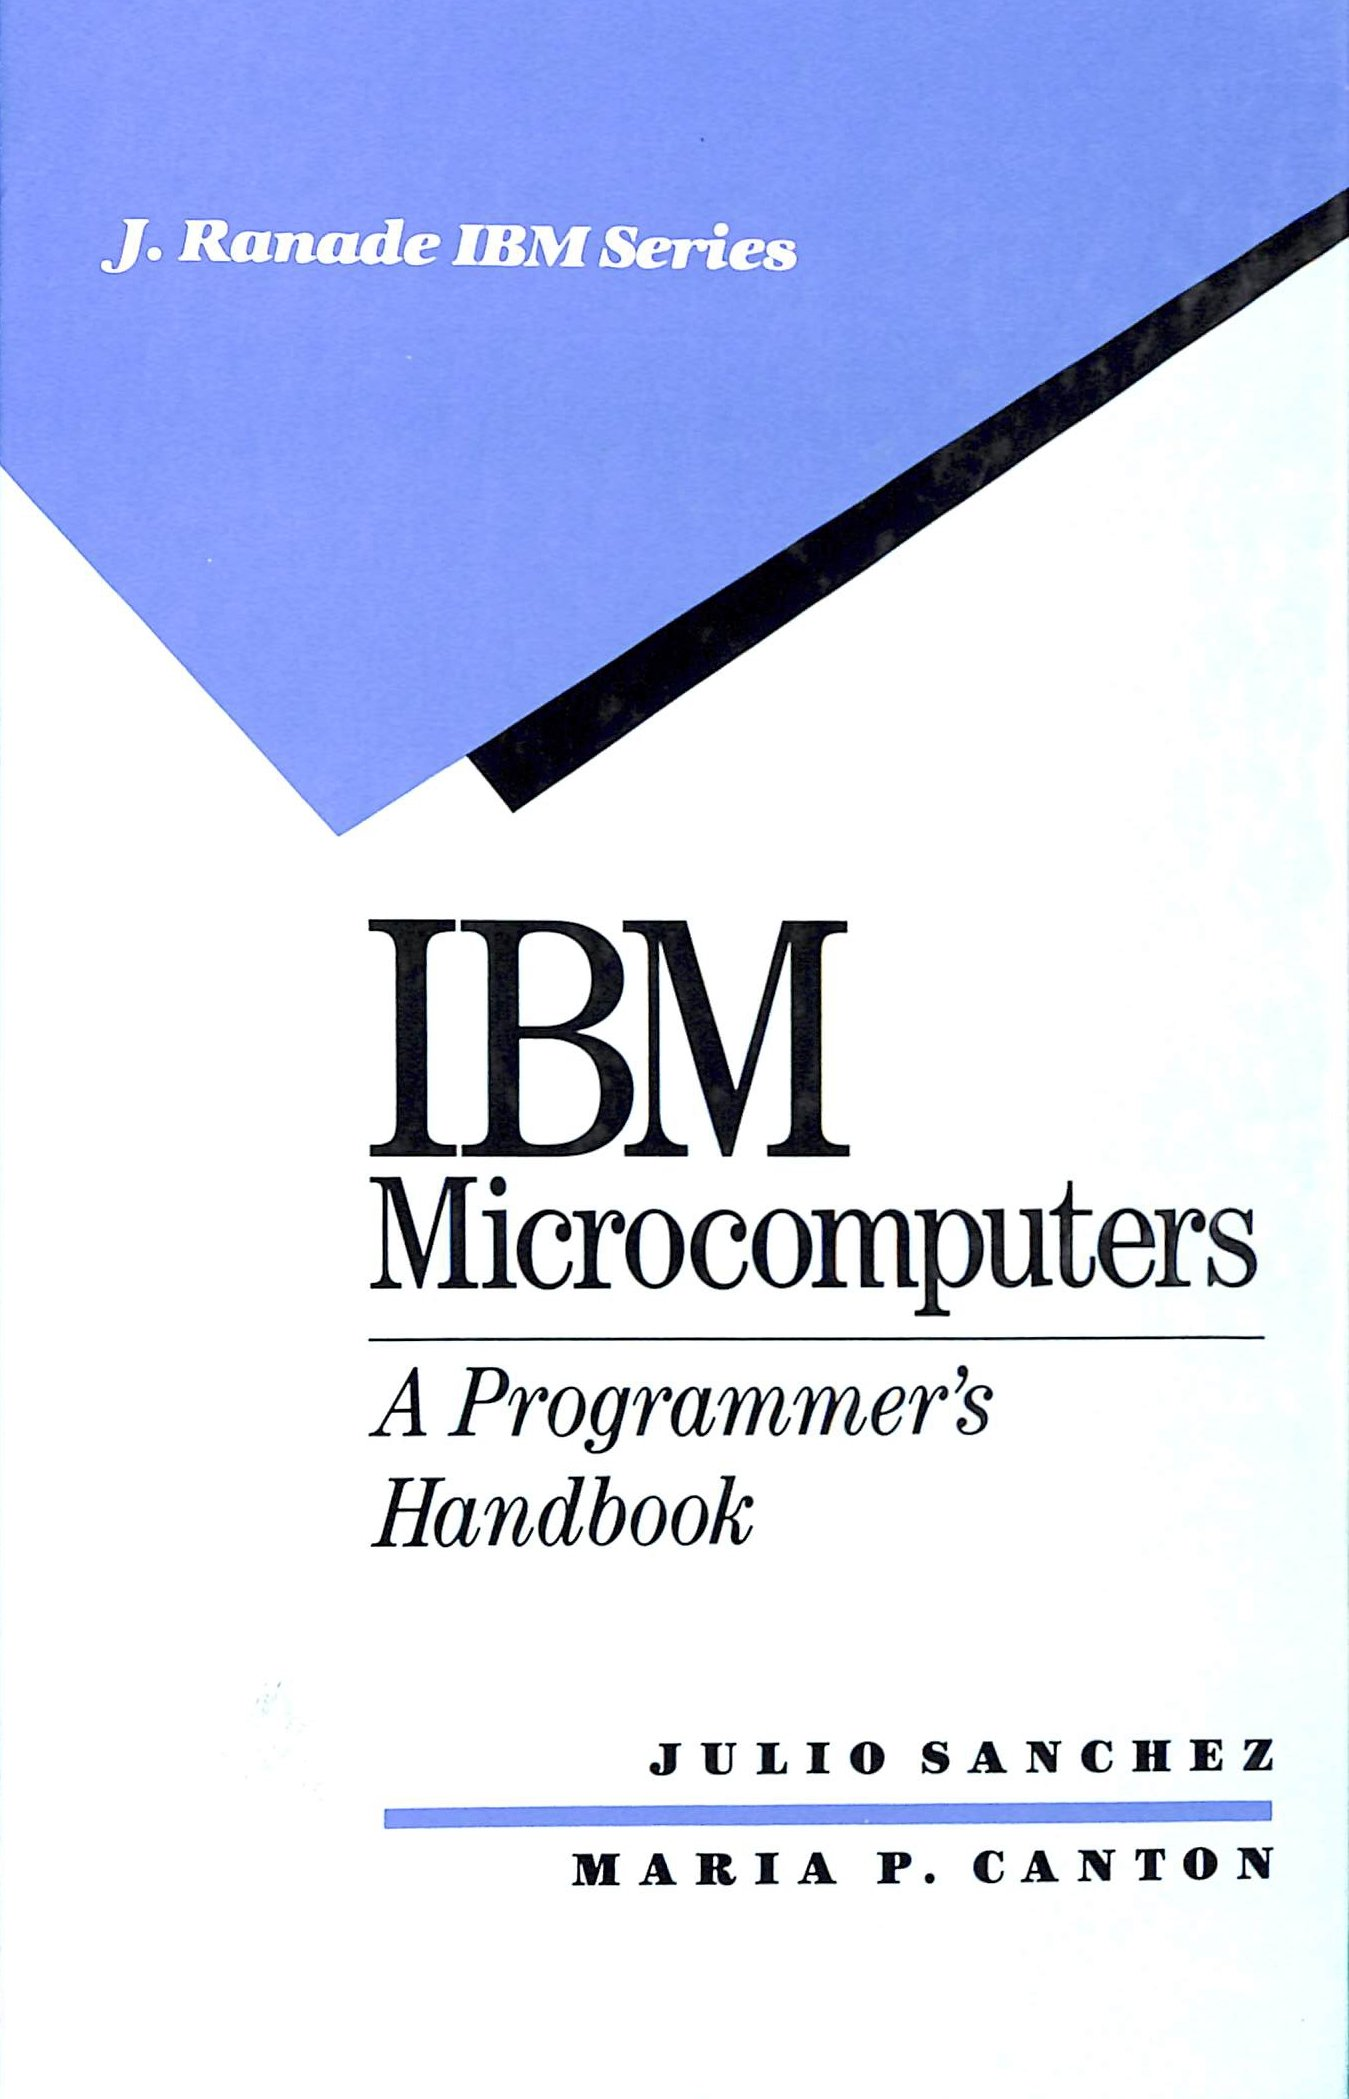 IBM Microcomputers: A Programmer's Handbook (J RANADE IBM SERIES)